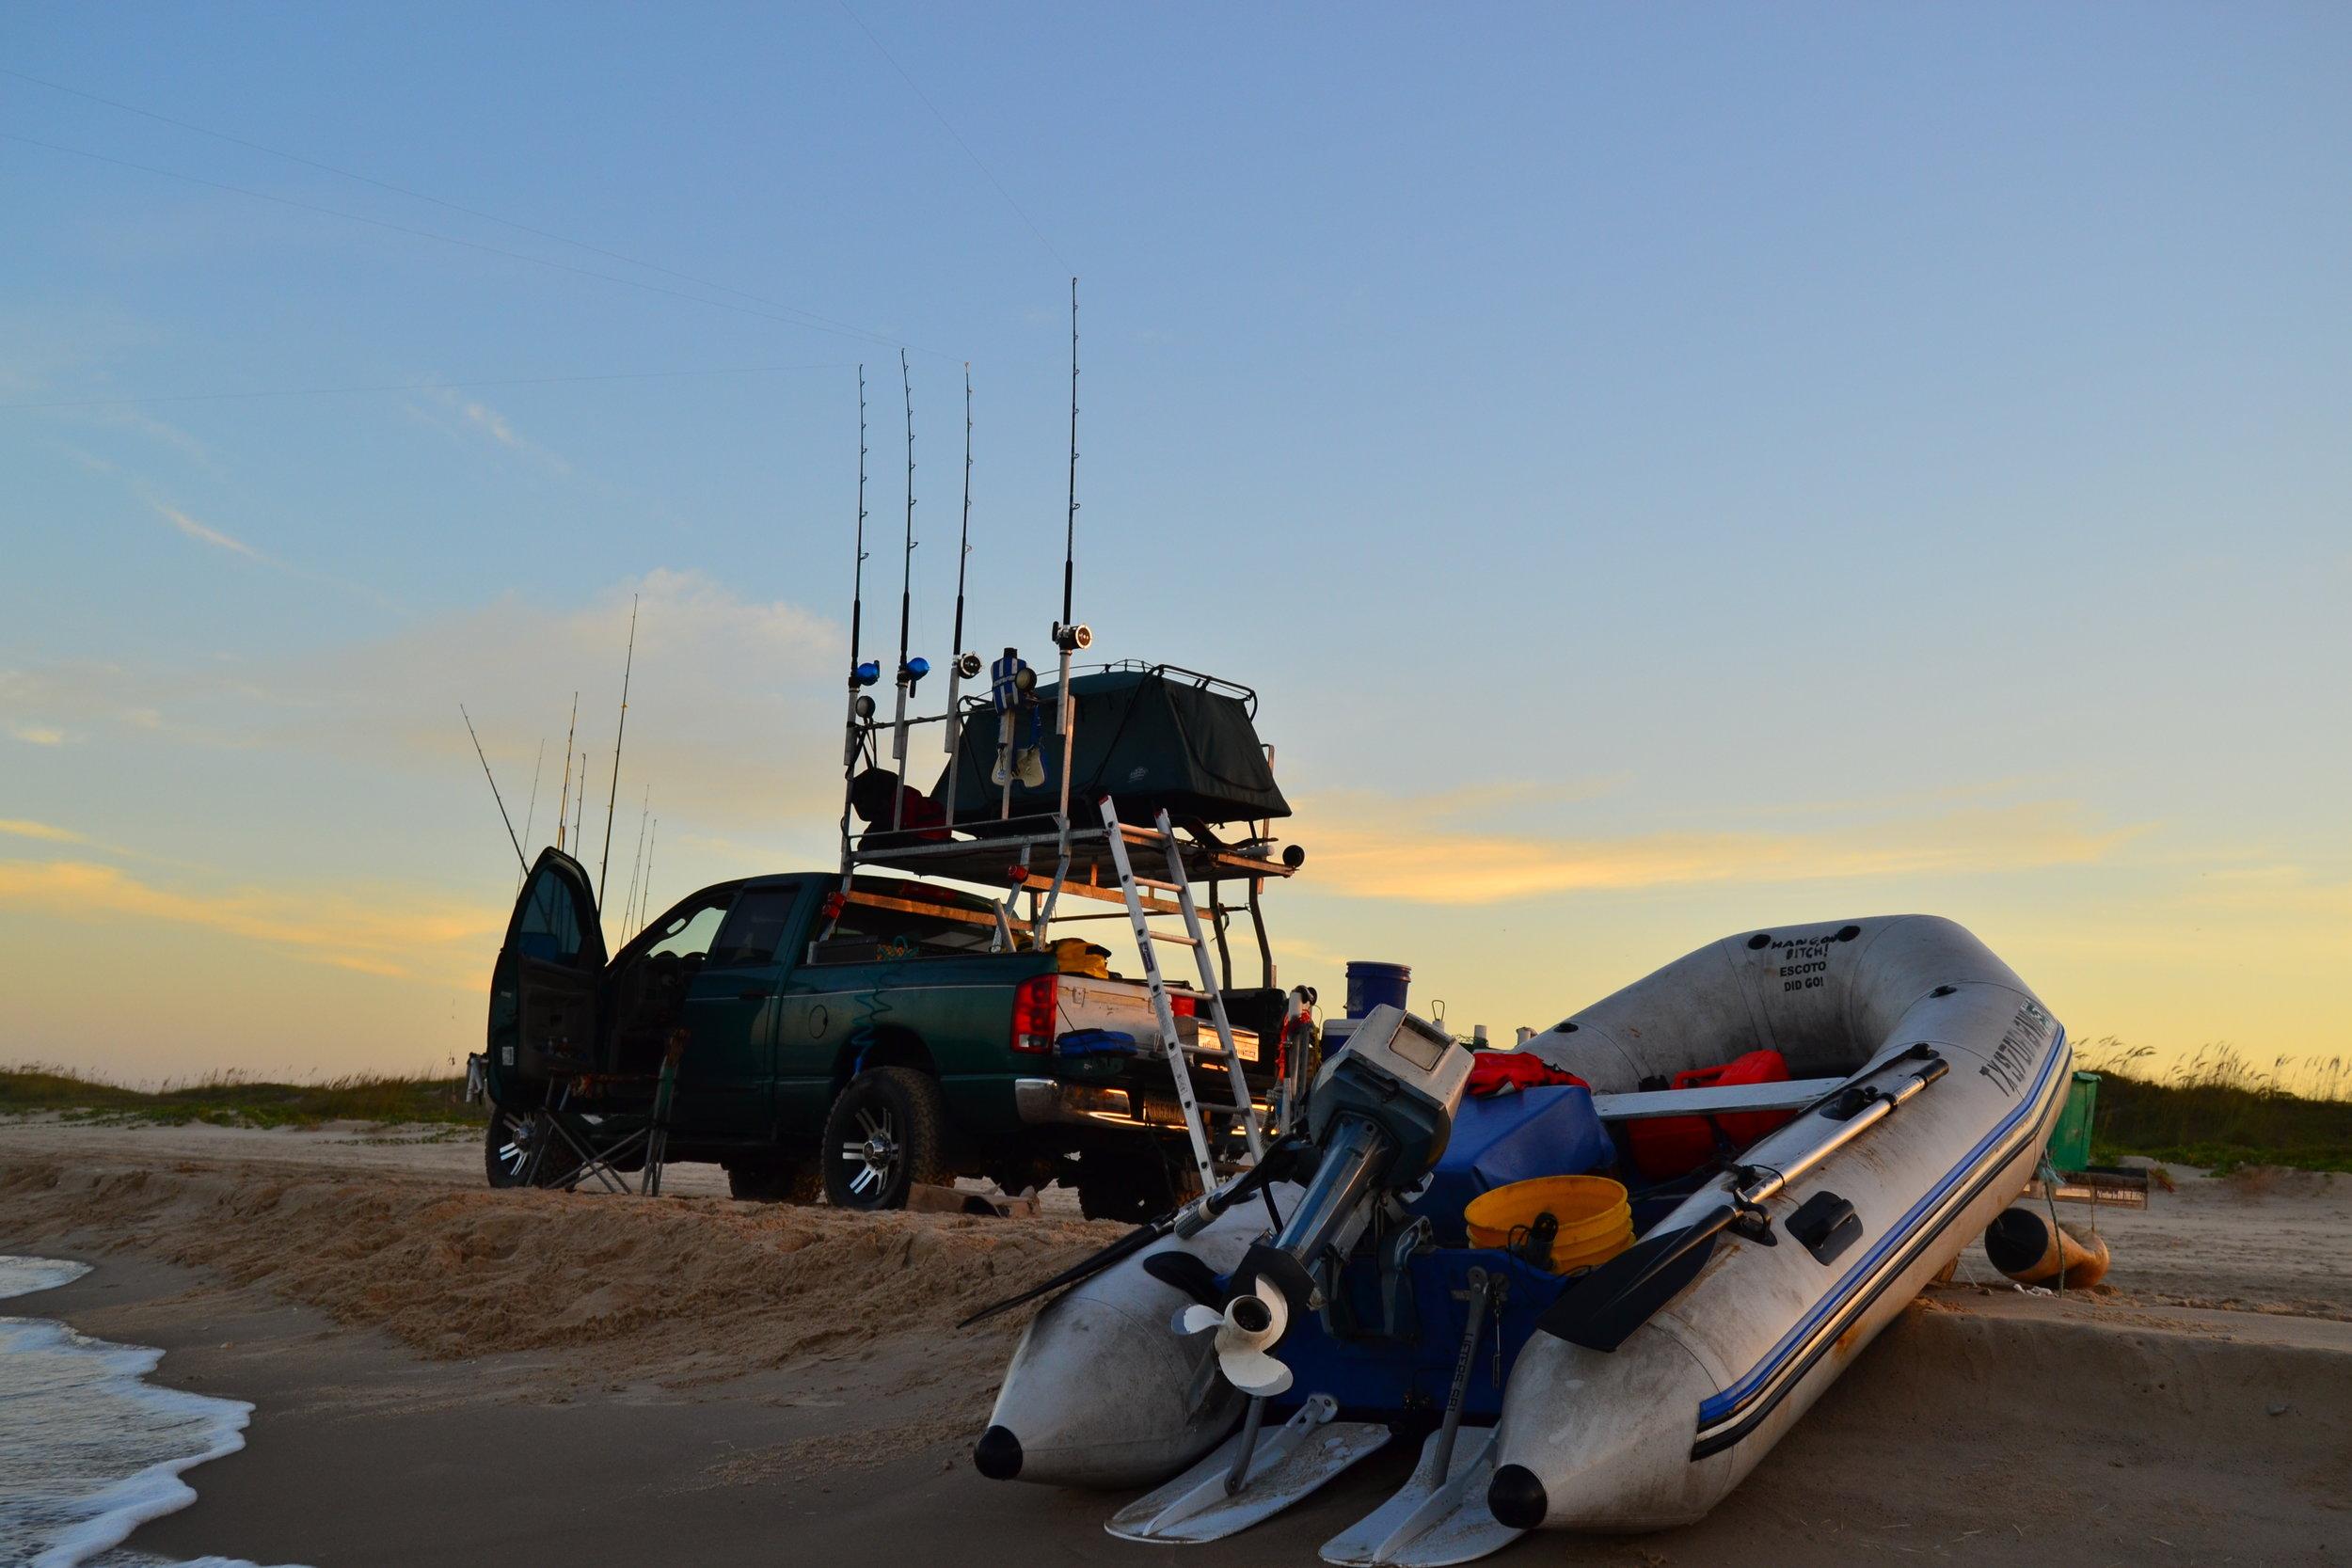 Shark fishing camp, dusk